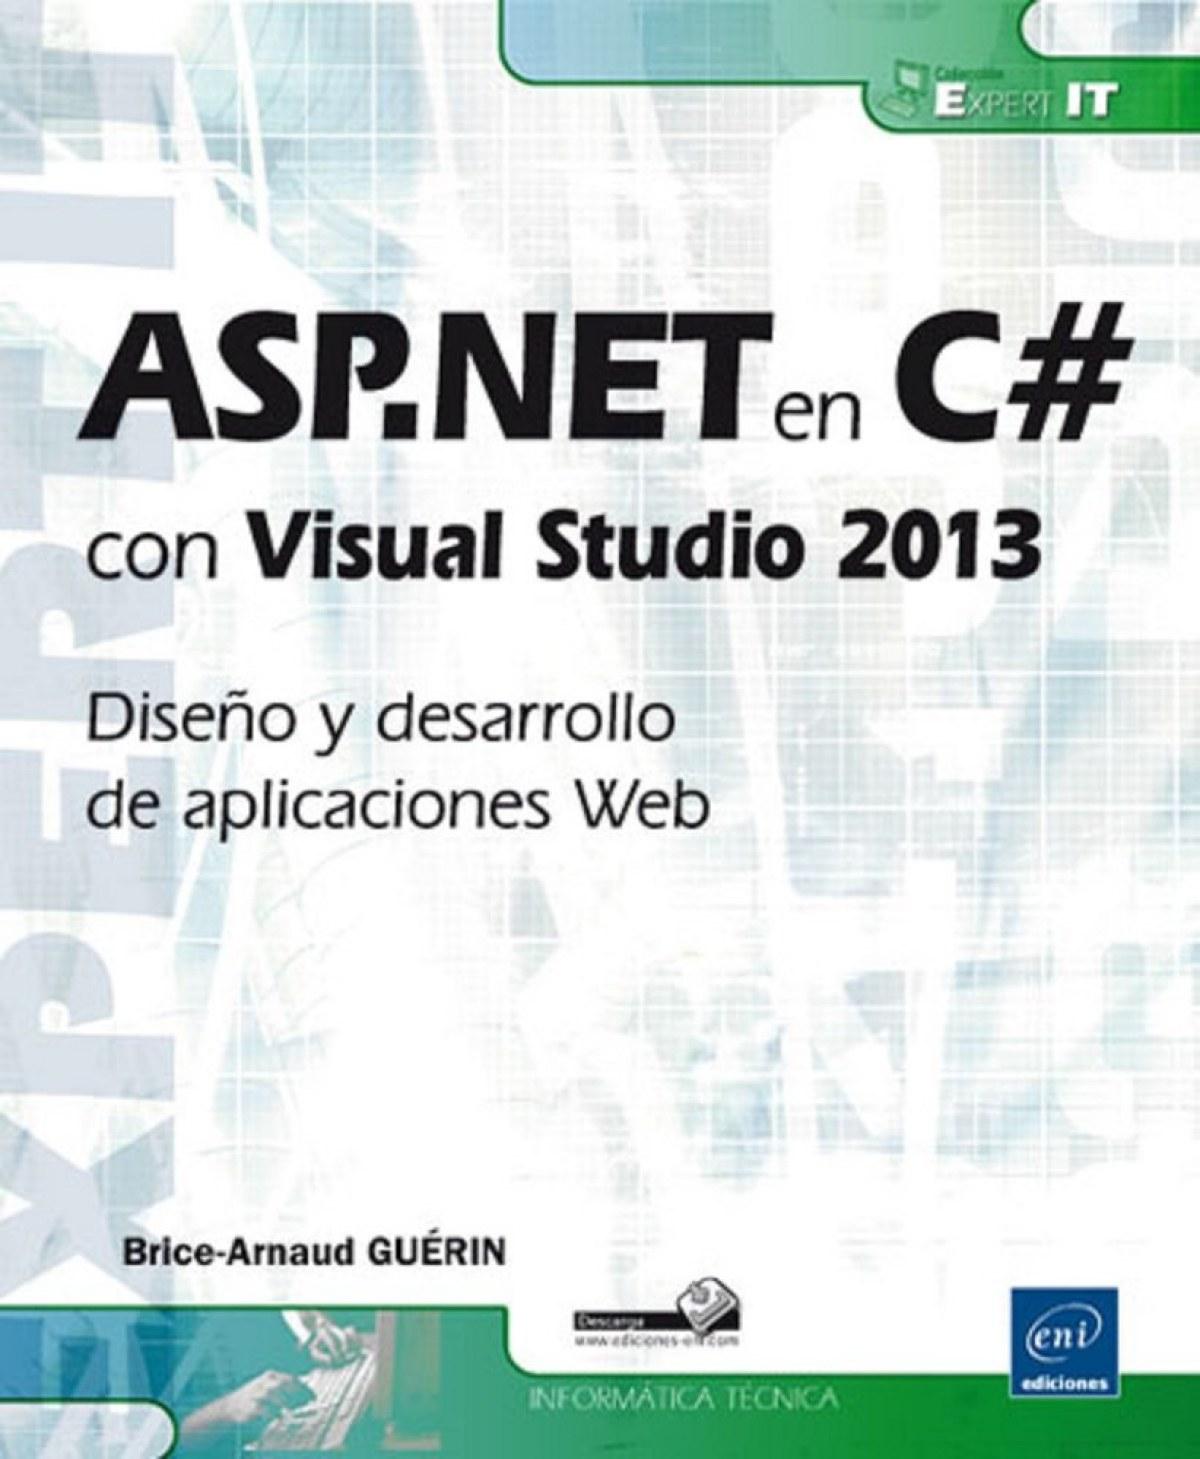 Expert IT ASP.NET en C# con Visual Studio 2013